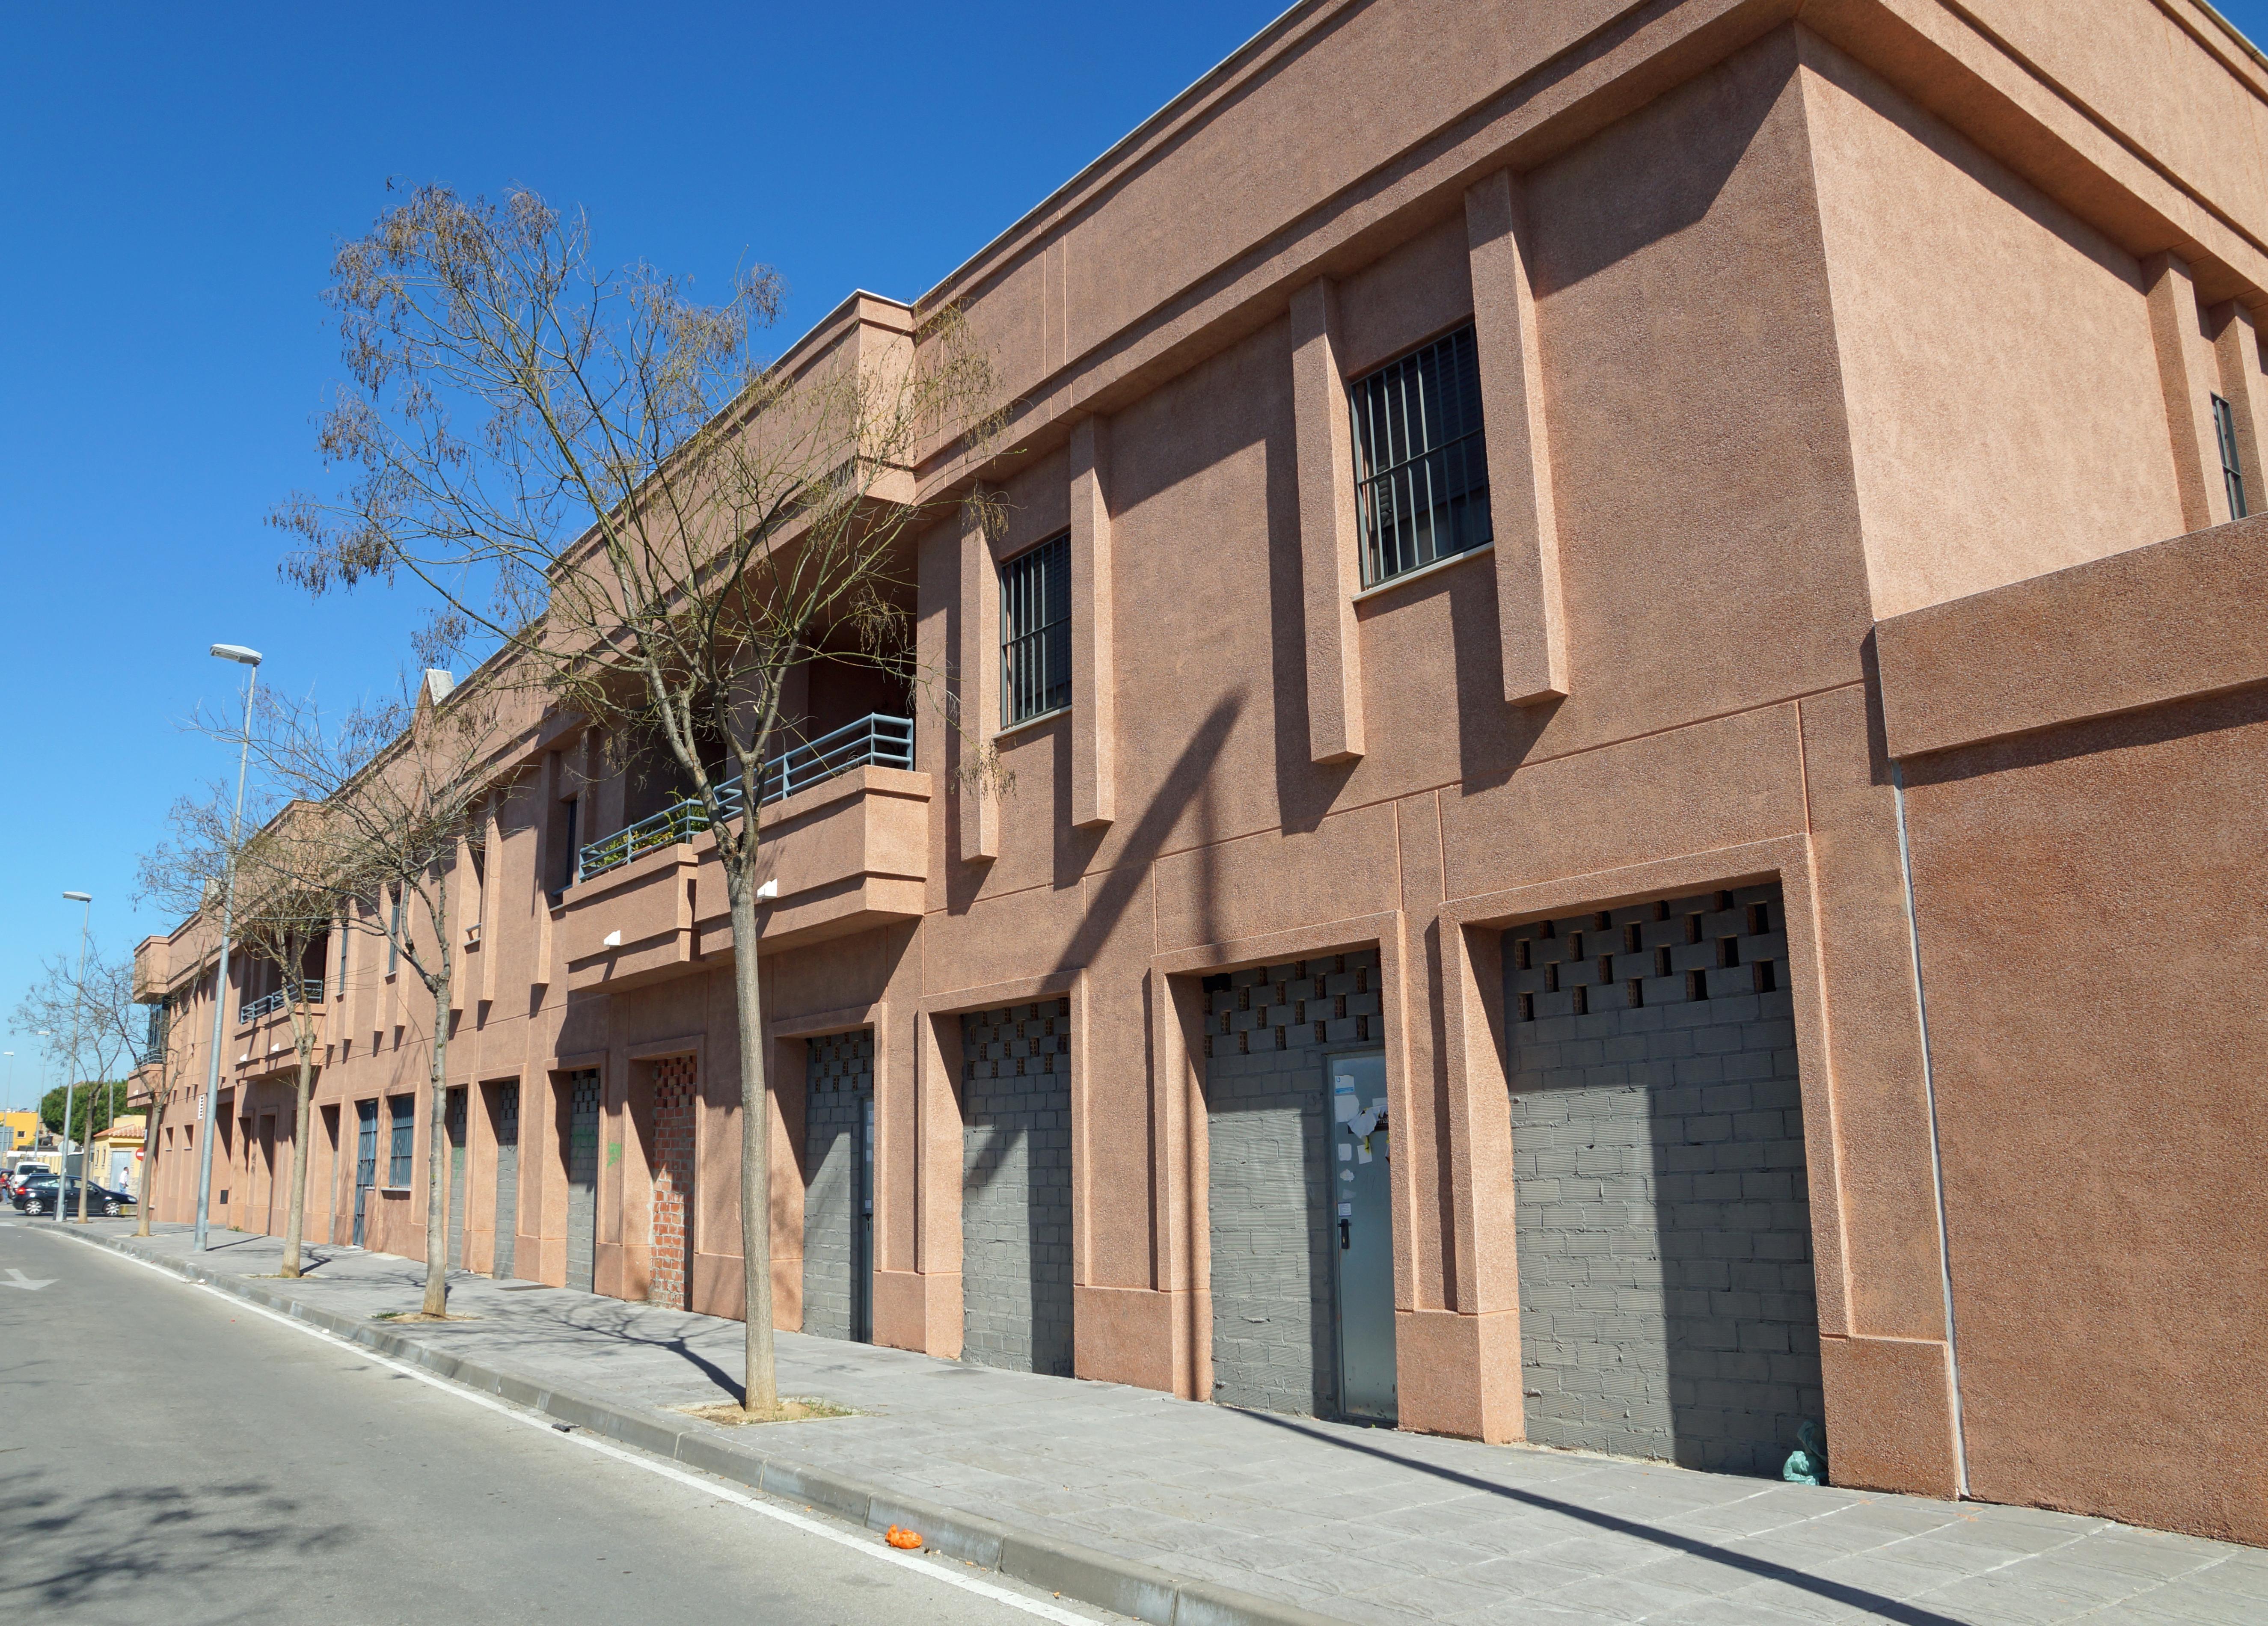 Local en venta en Estella del Marqués, Jerez de la Frontera, Cádiz, Calle Periodista Juan Andres Garcia, 57.800 €, 78 m2